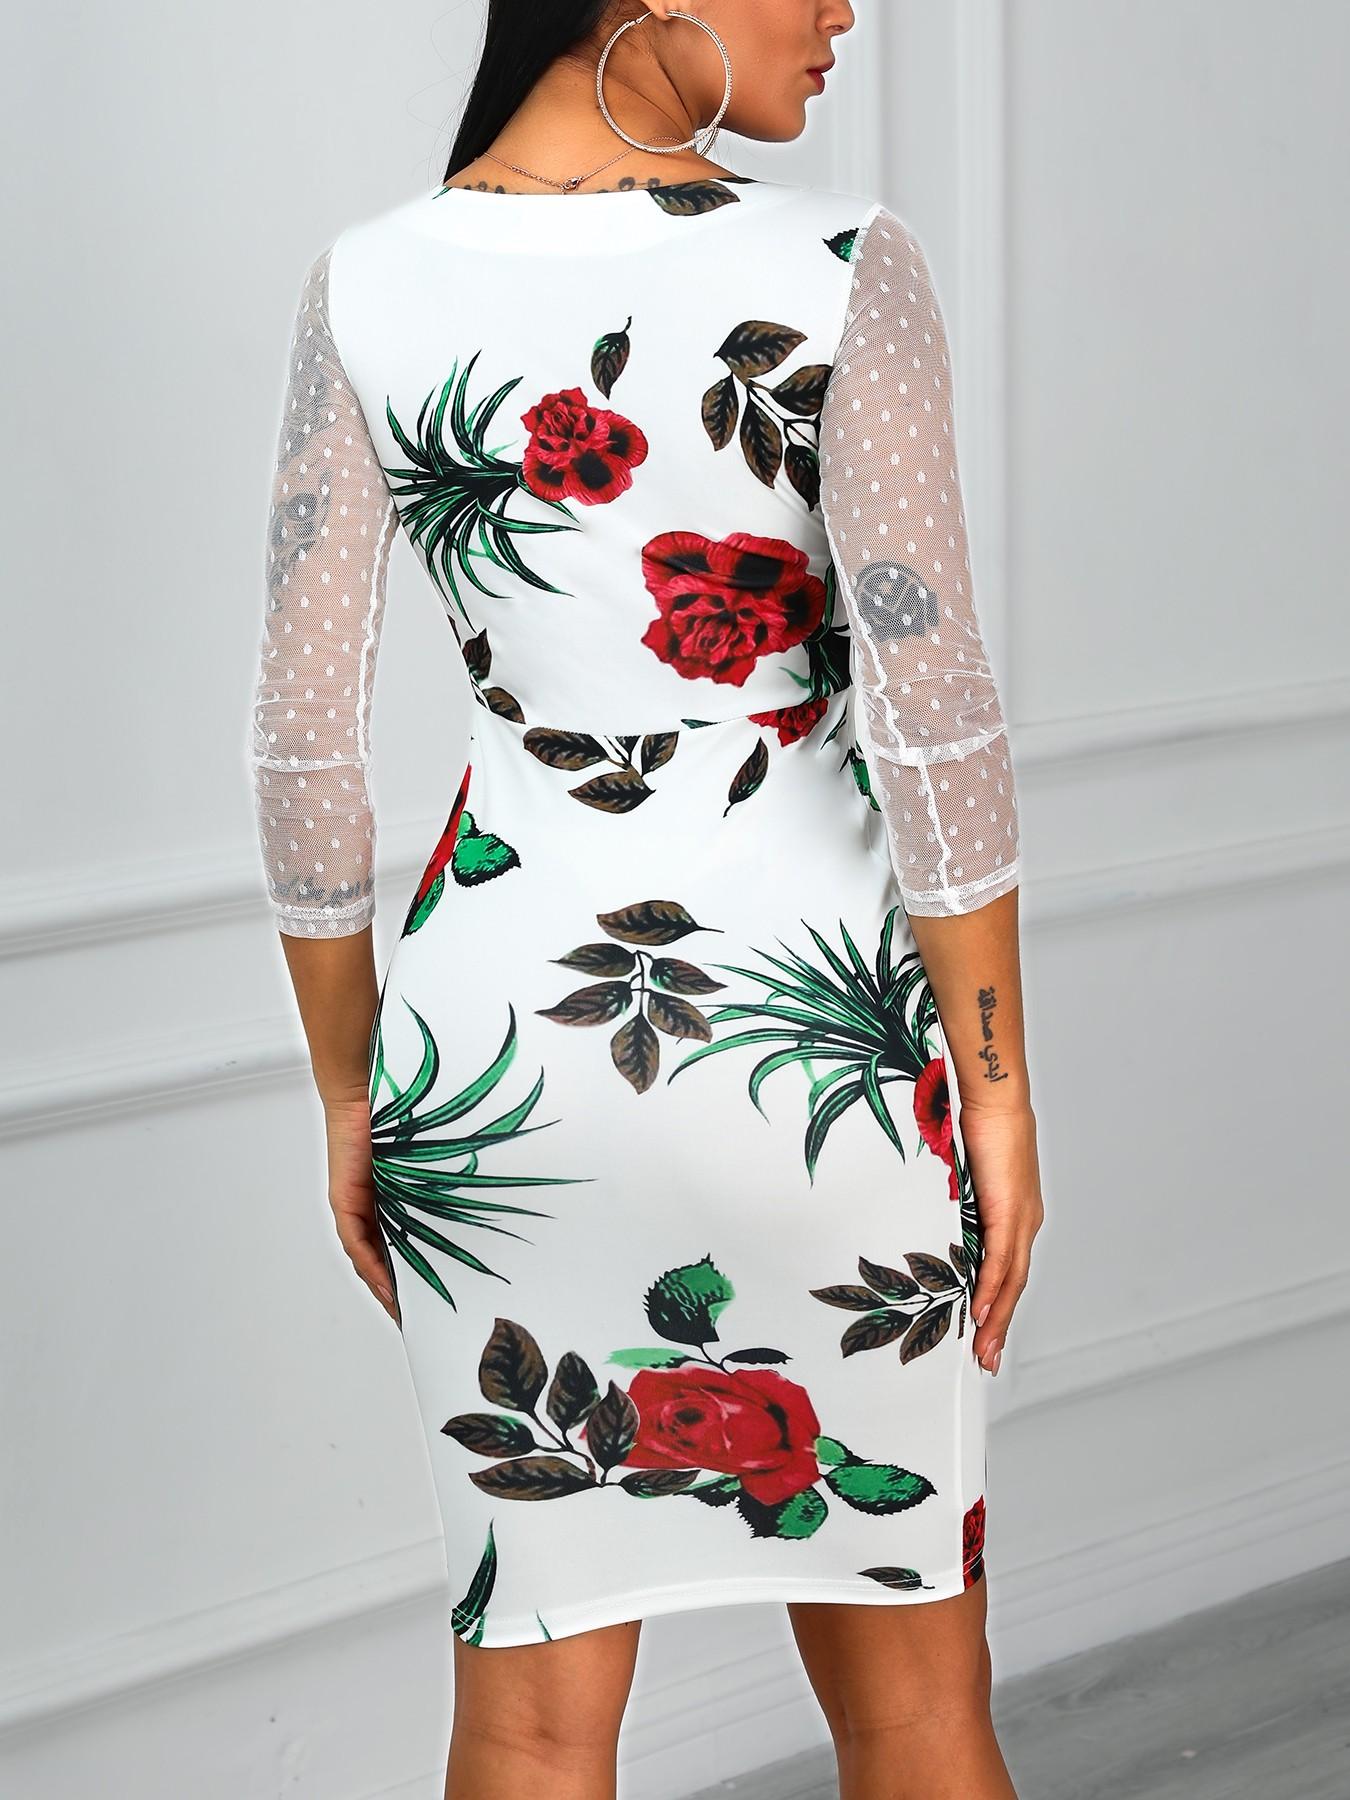 boutiquefeel / Floral Print Mesh Insert Dress